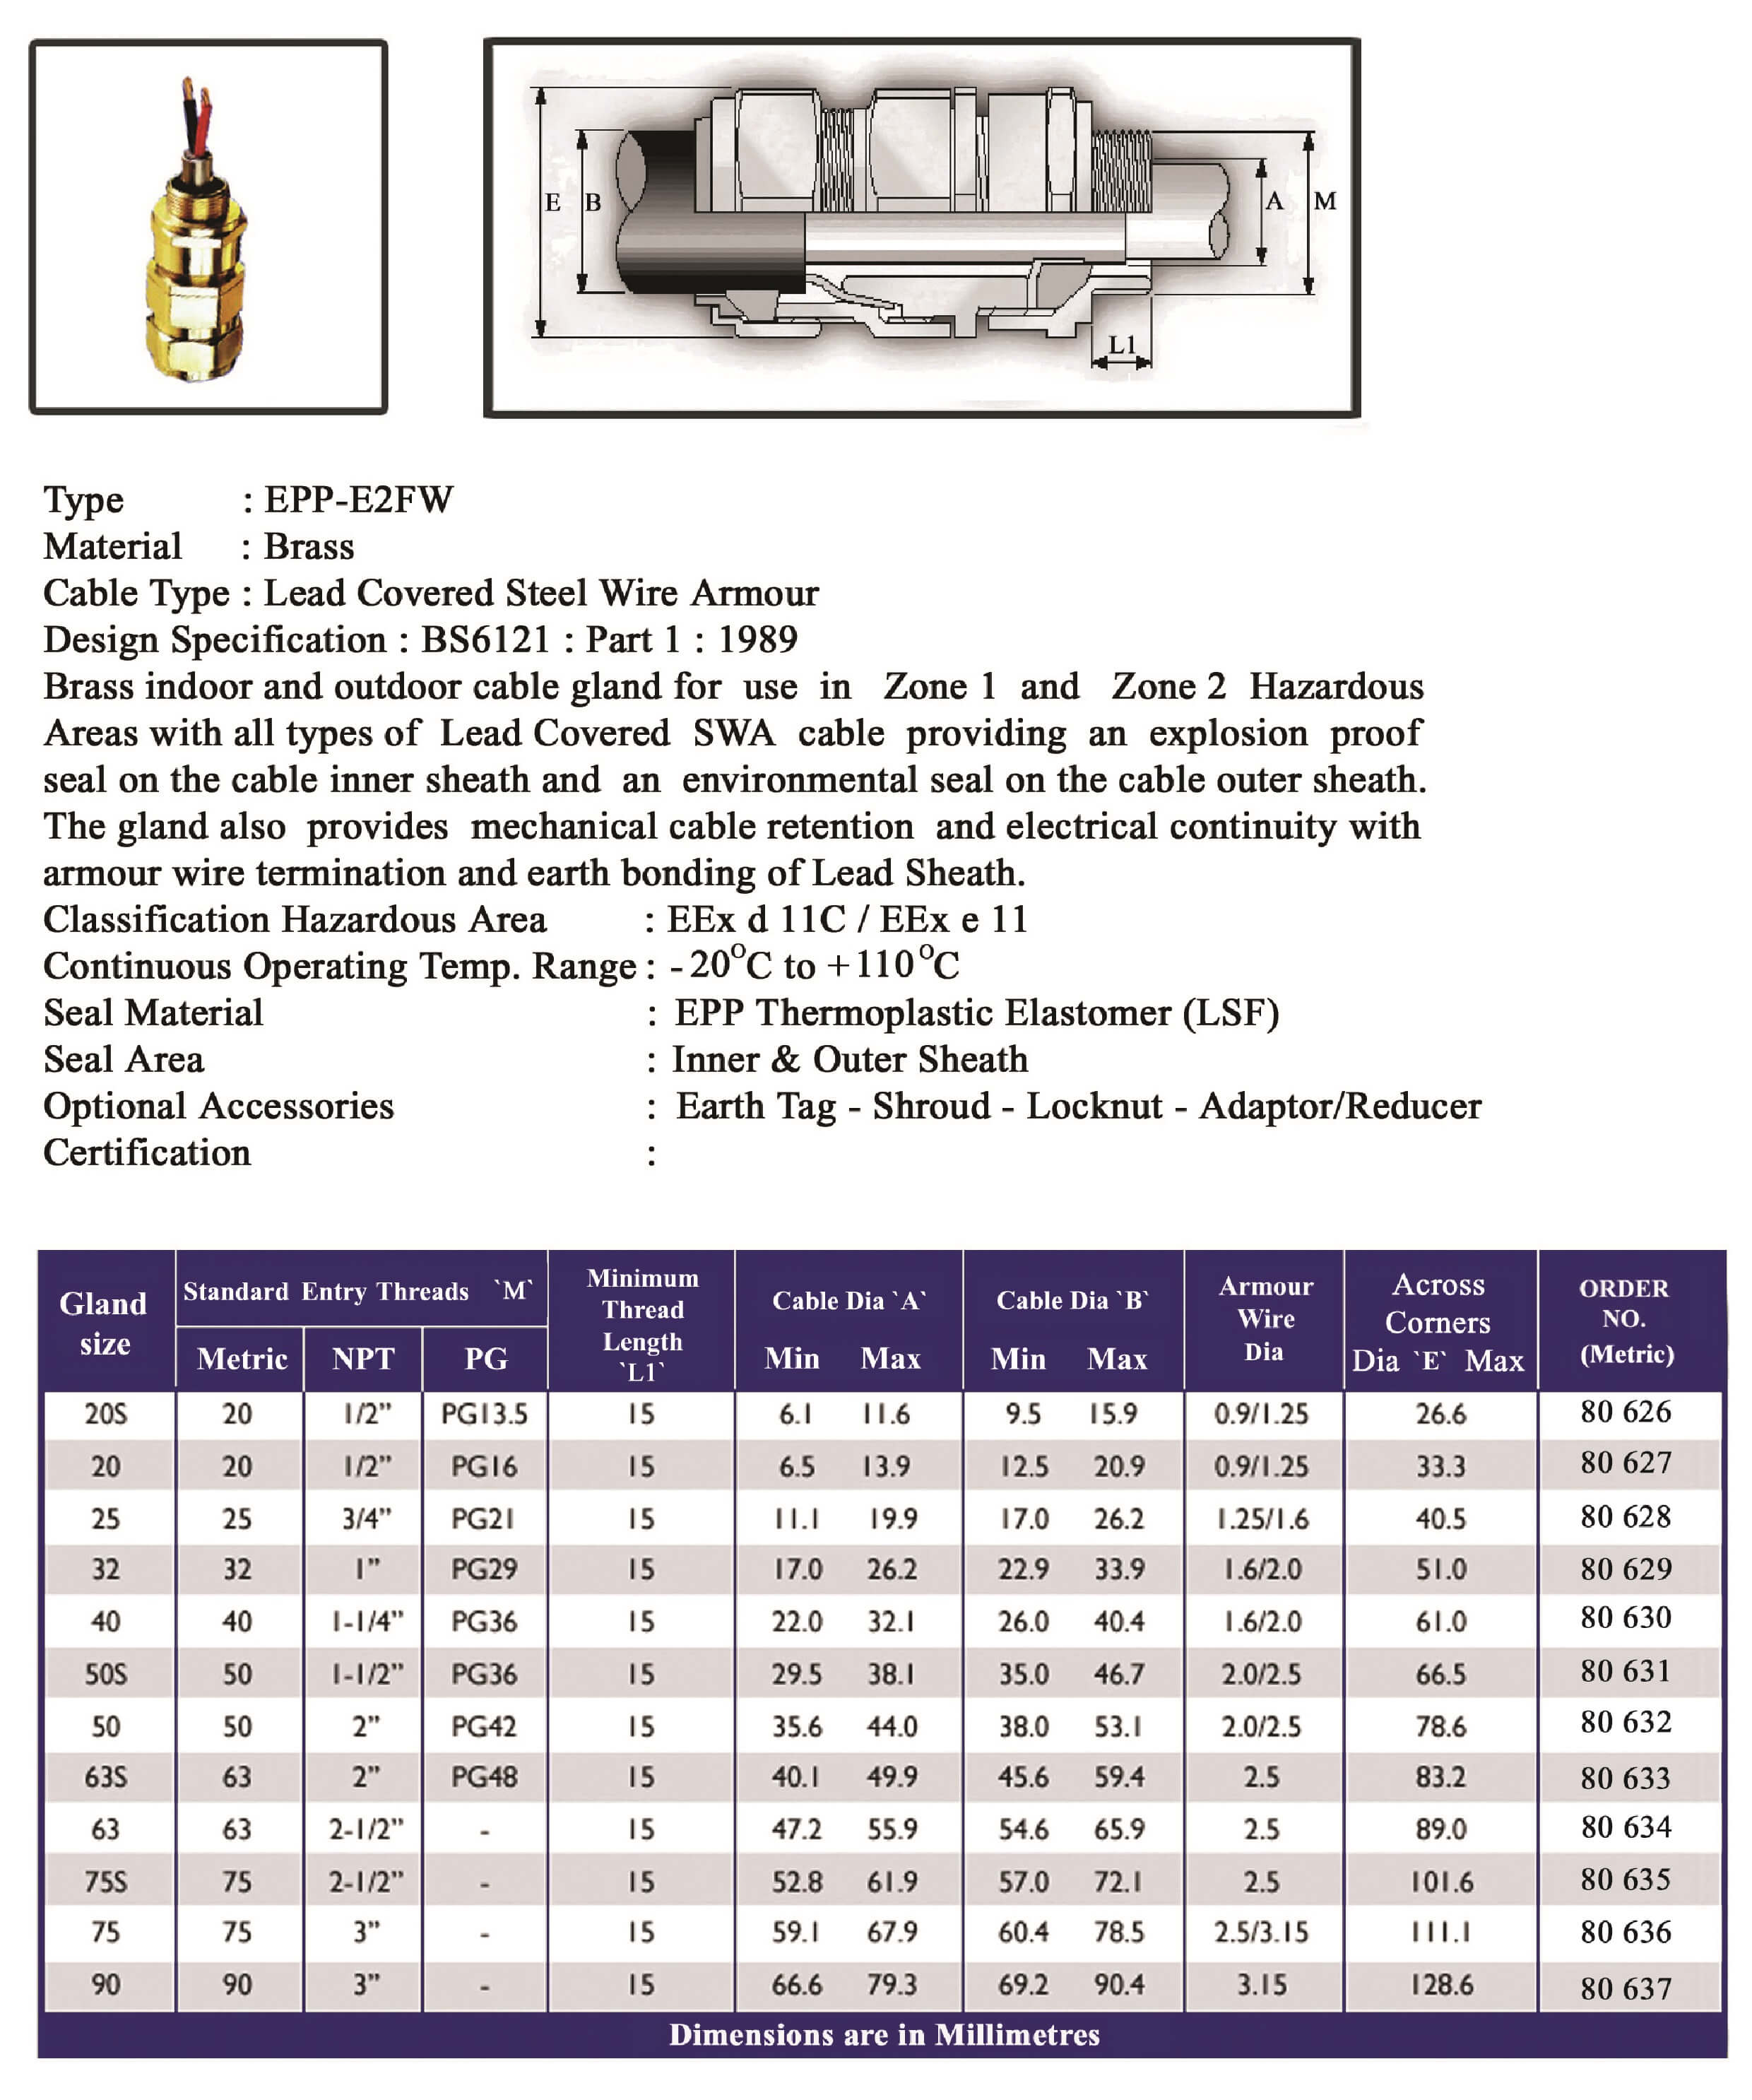 E.P.P - E2FW Technical Datasheet